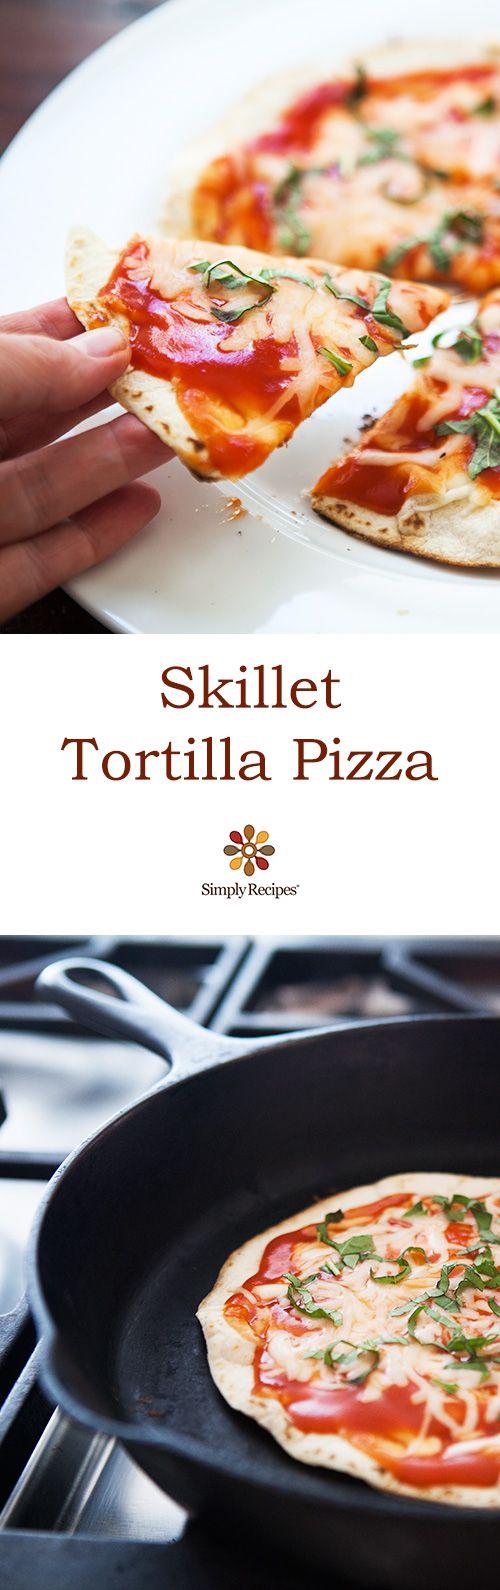 Skillet Tortilla Pizza ~ Super easy individual pizzas made with flour tortillas, mozzarella cheese, tomato sauce and basil, in a cast iron skillet on the stovetop. ~ SimplyRecipes.com #Majestic #Pizza #BuffaloBucksCoffee